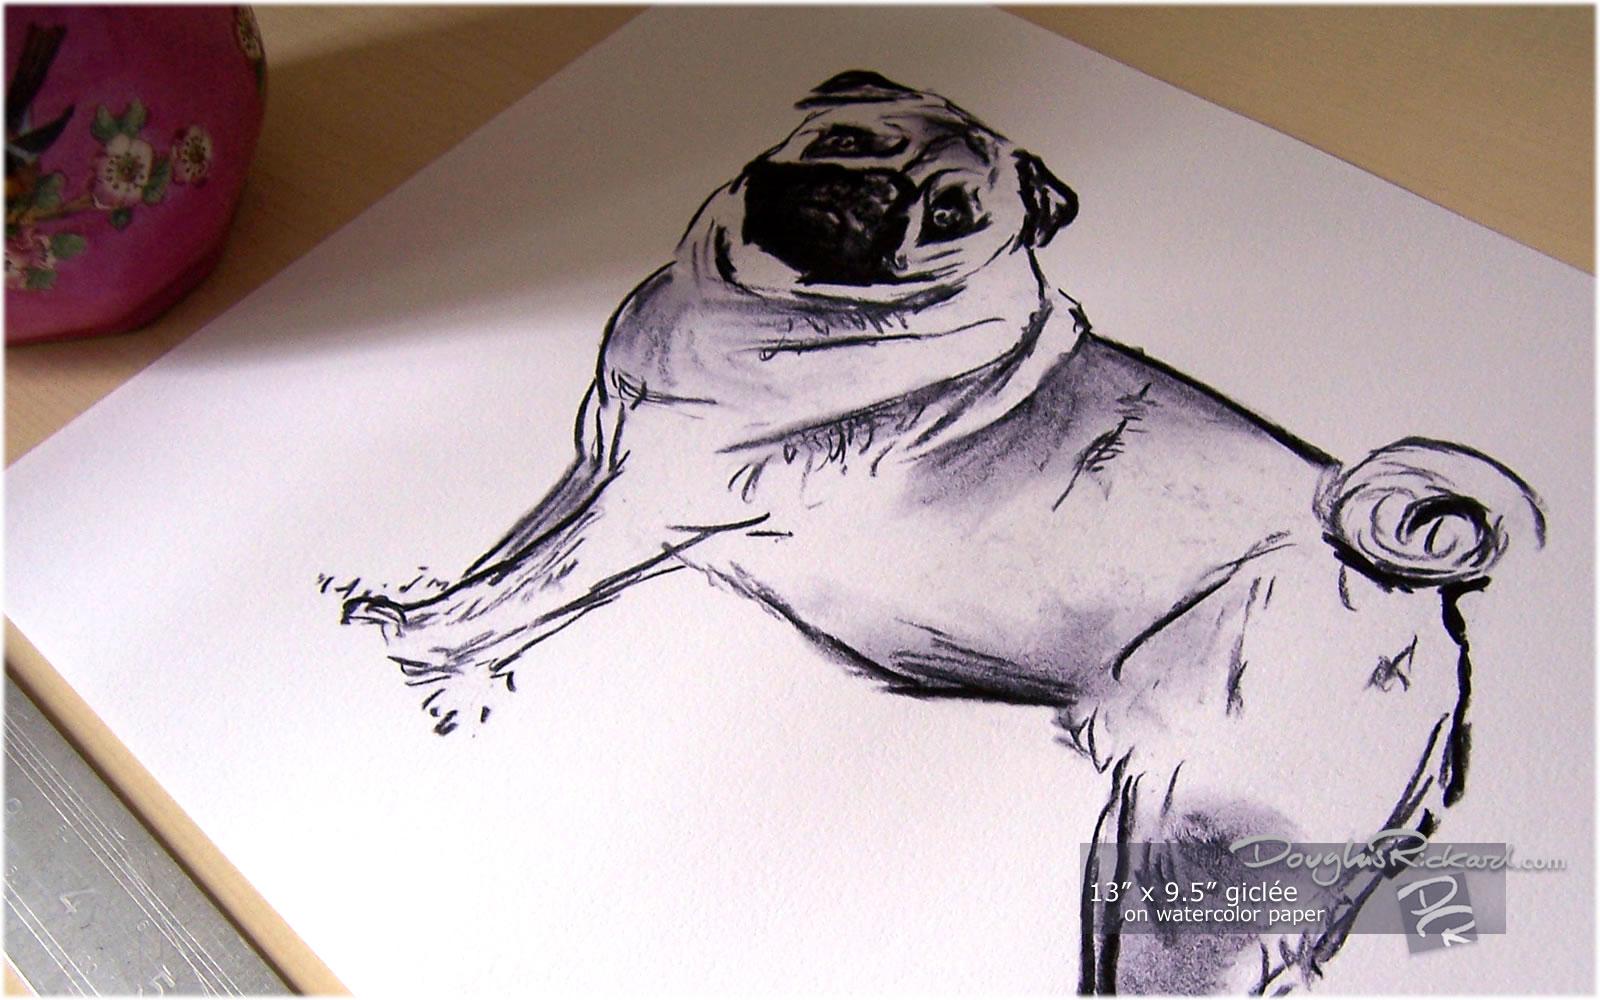 Drawn pug watercolor A Pug Buy Pug Drawing